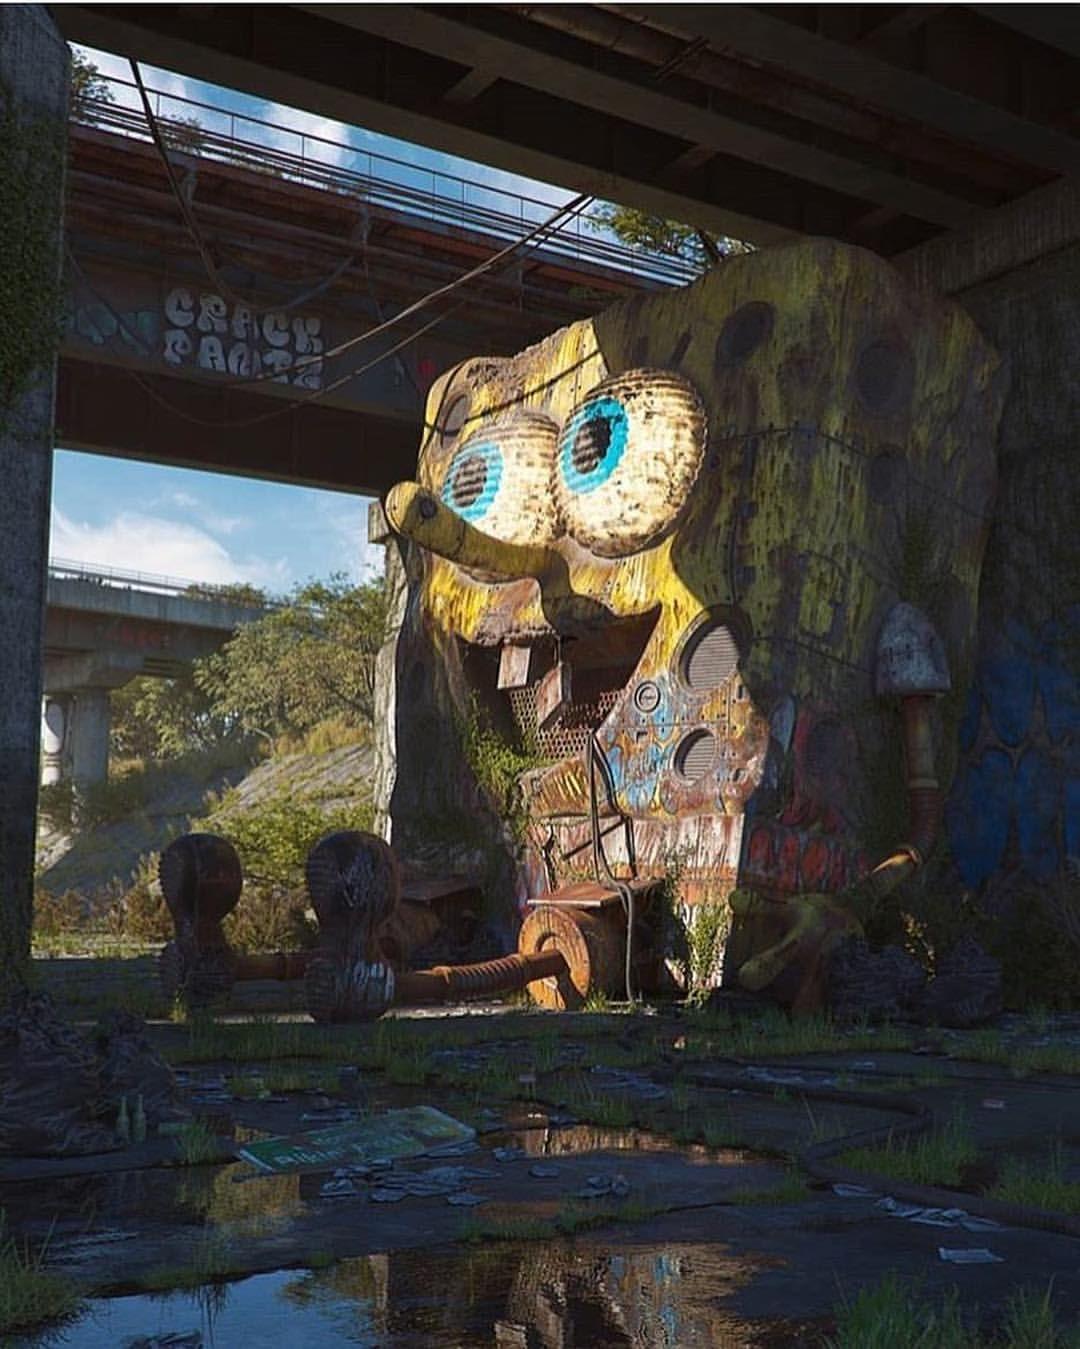 #abandoned #abandonedplaces #spongebob